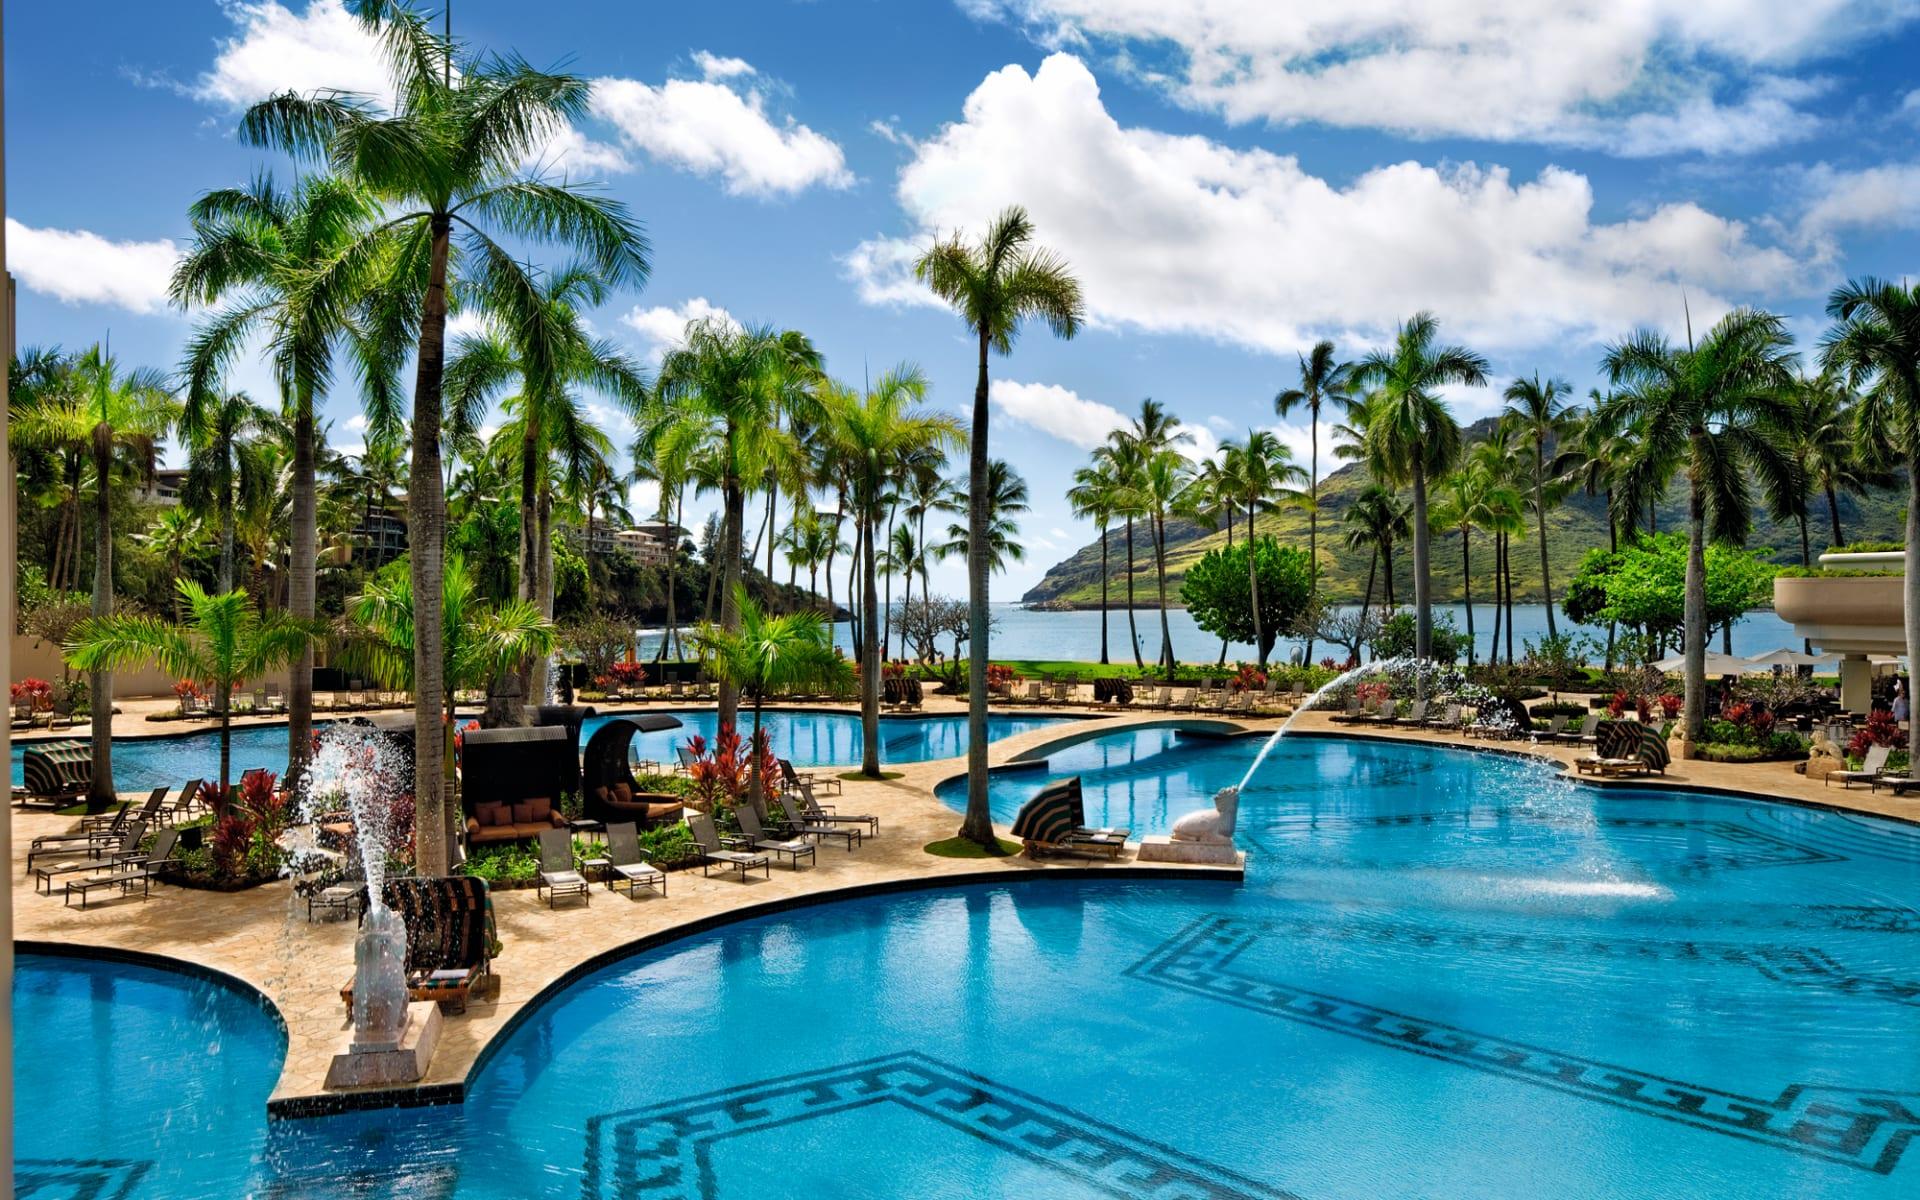 Hotels Kauai Hawaii USA   Beratung und attraktive Preise   Knecht ...